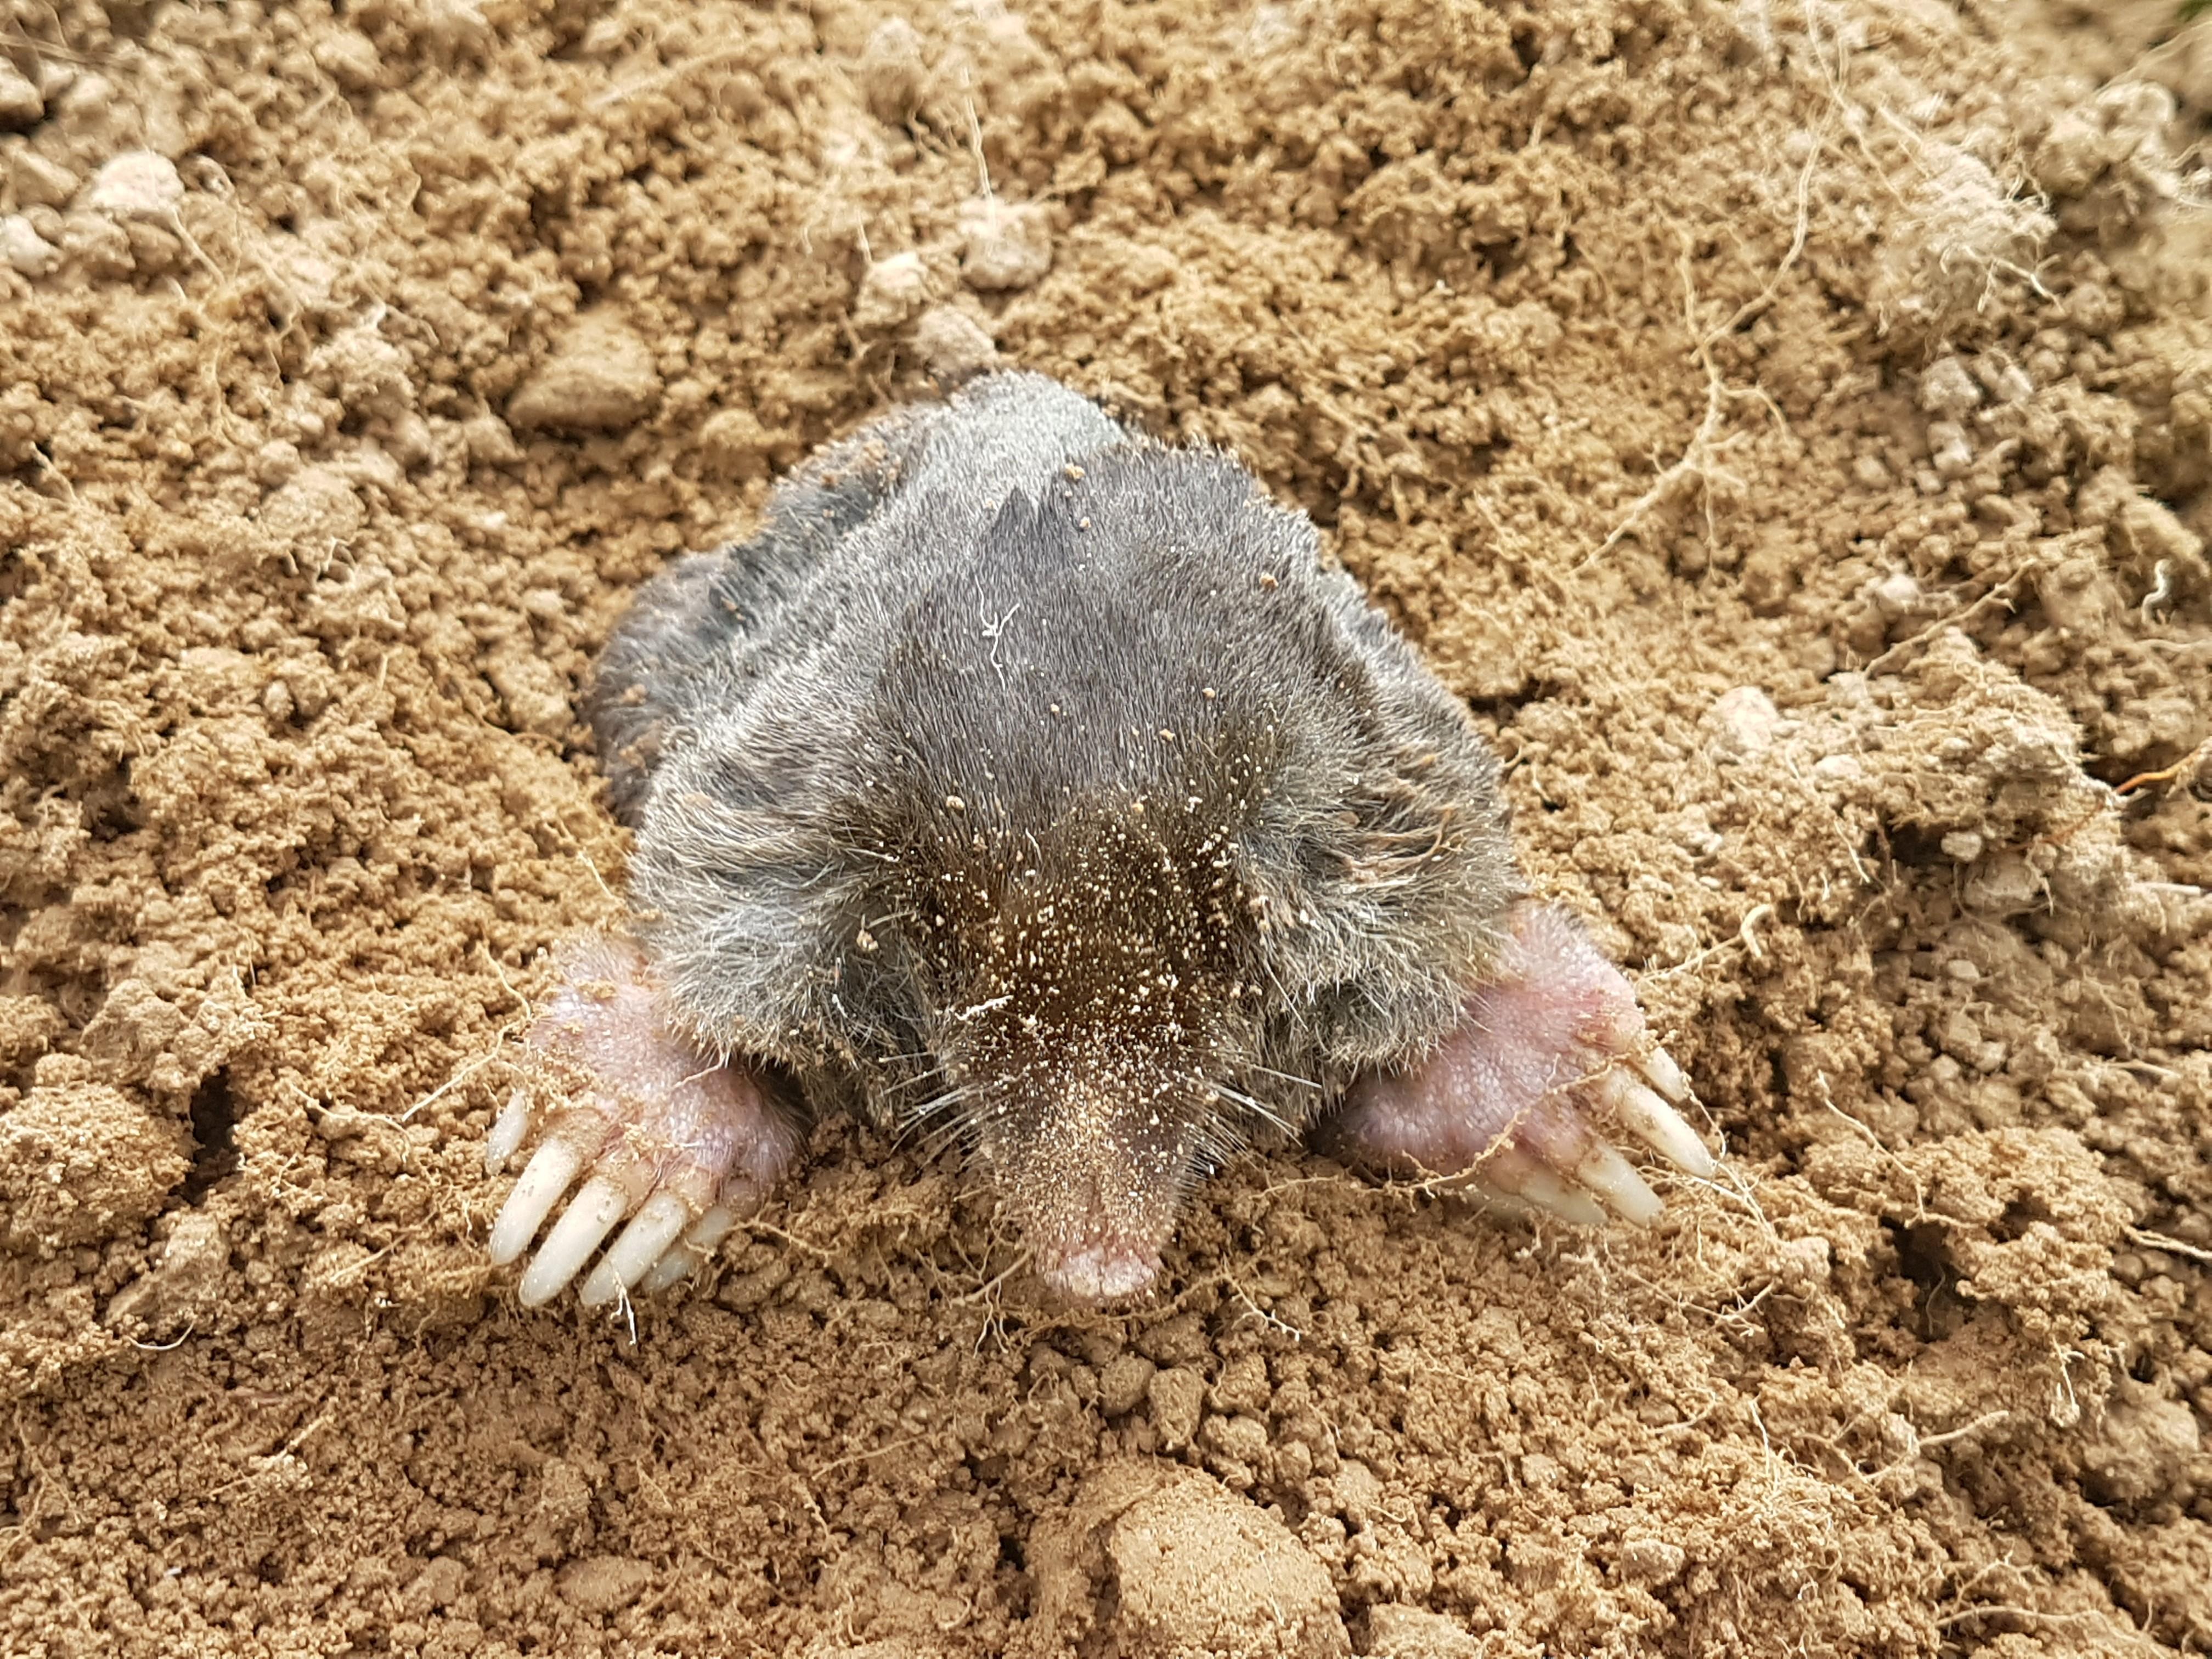 Mole showing through soil